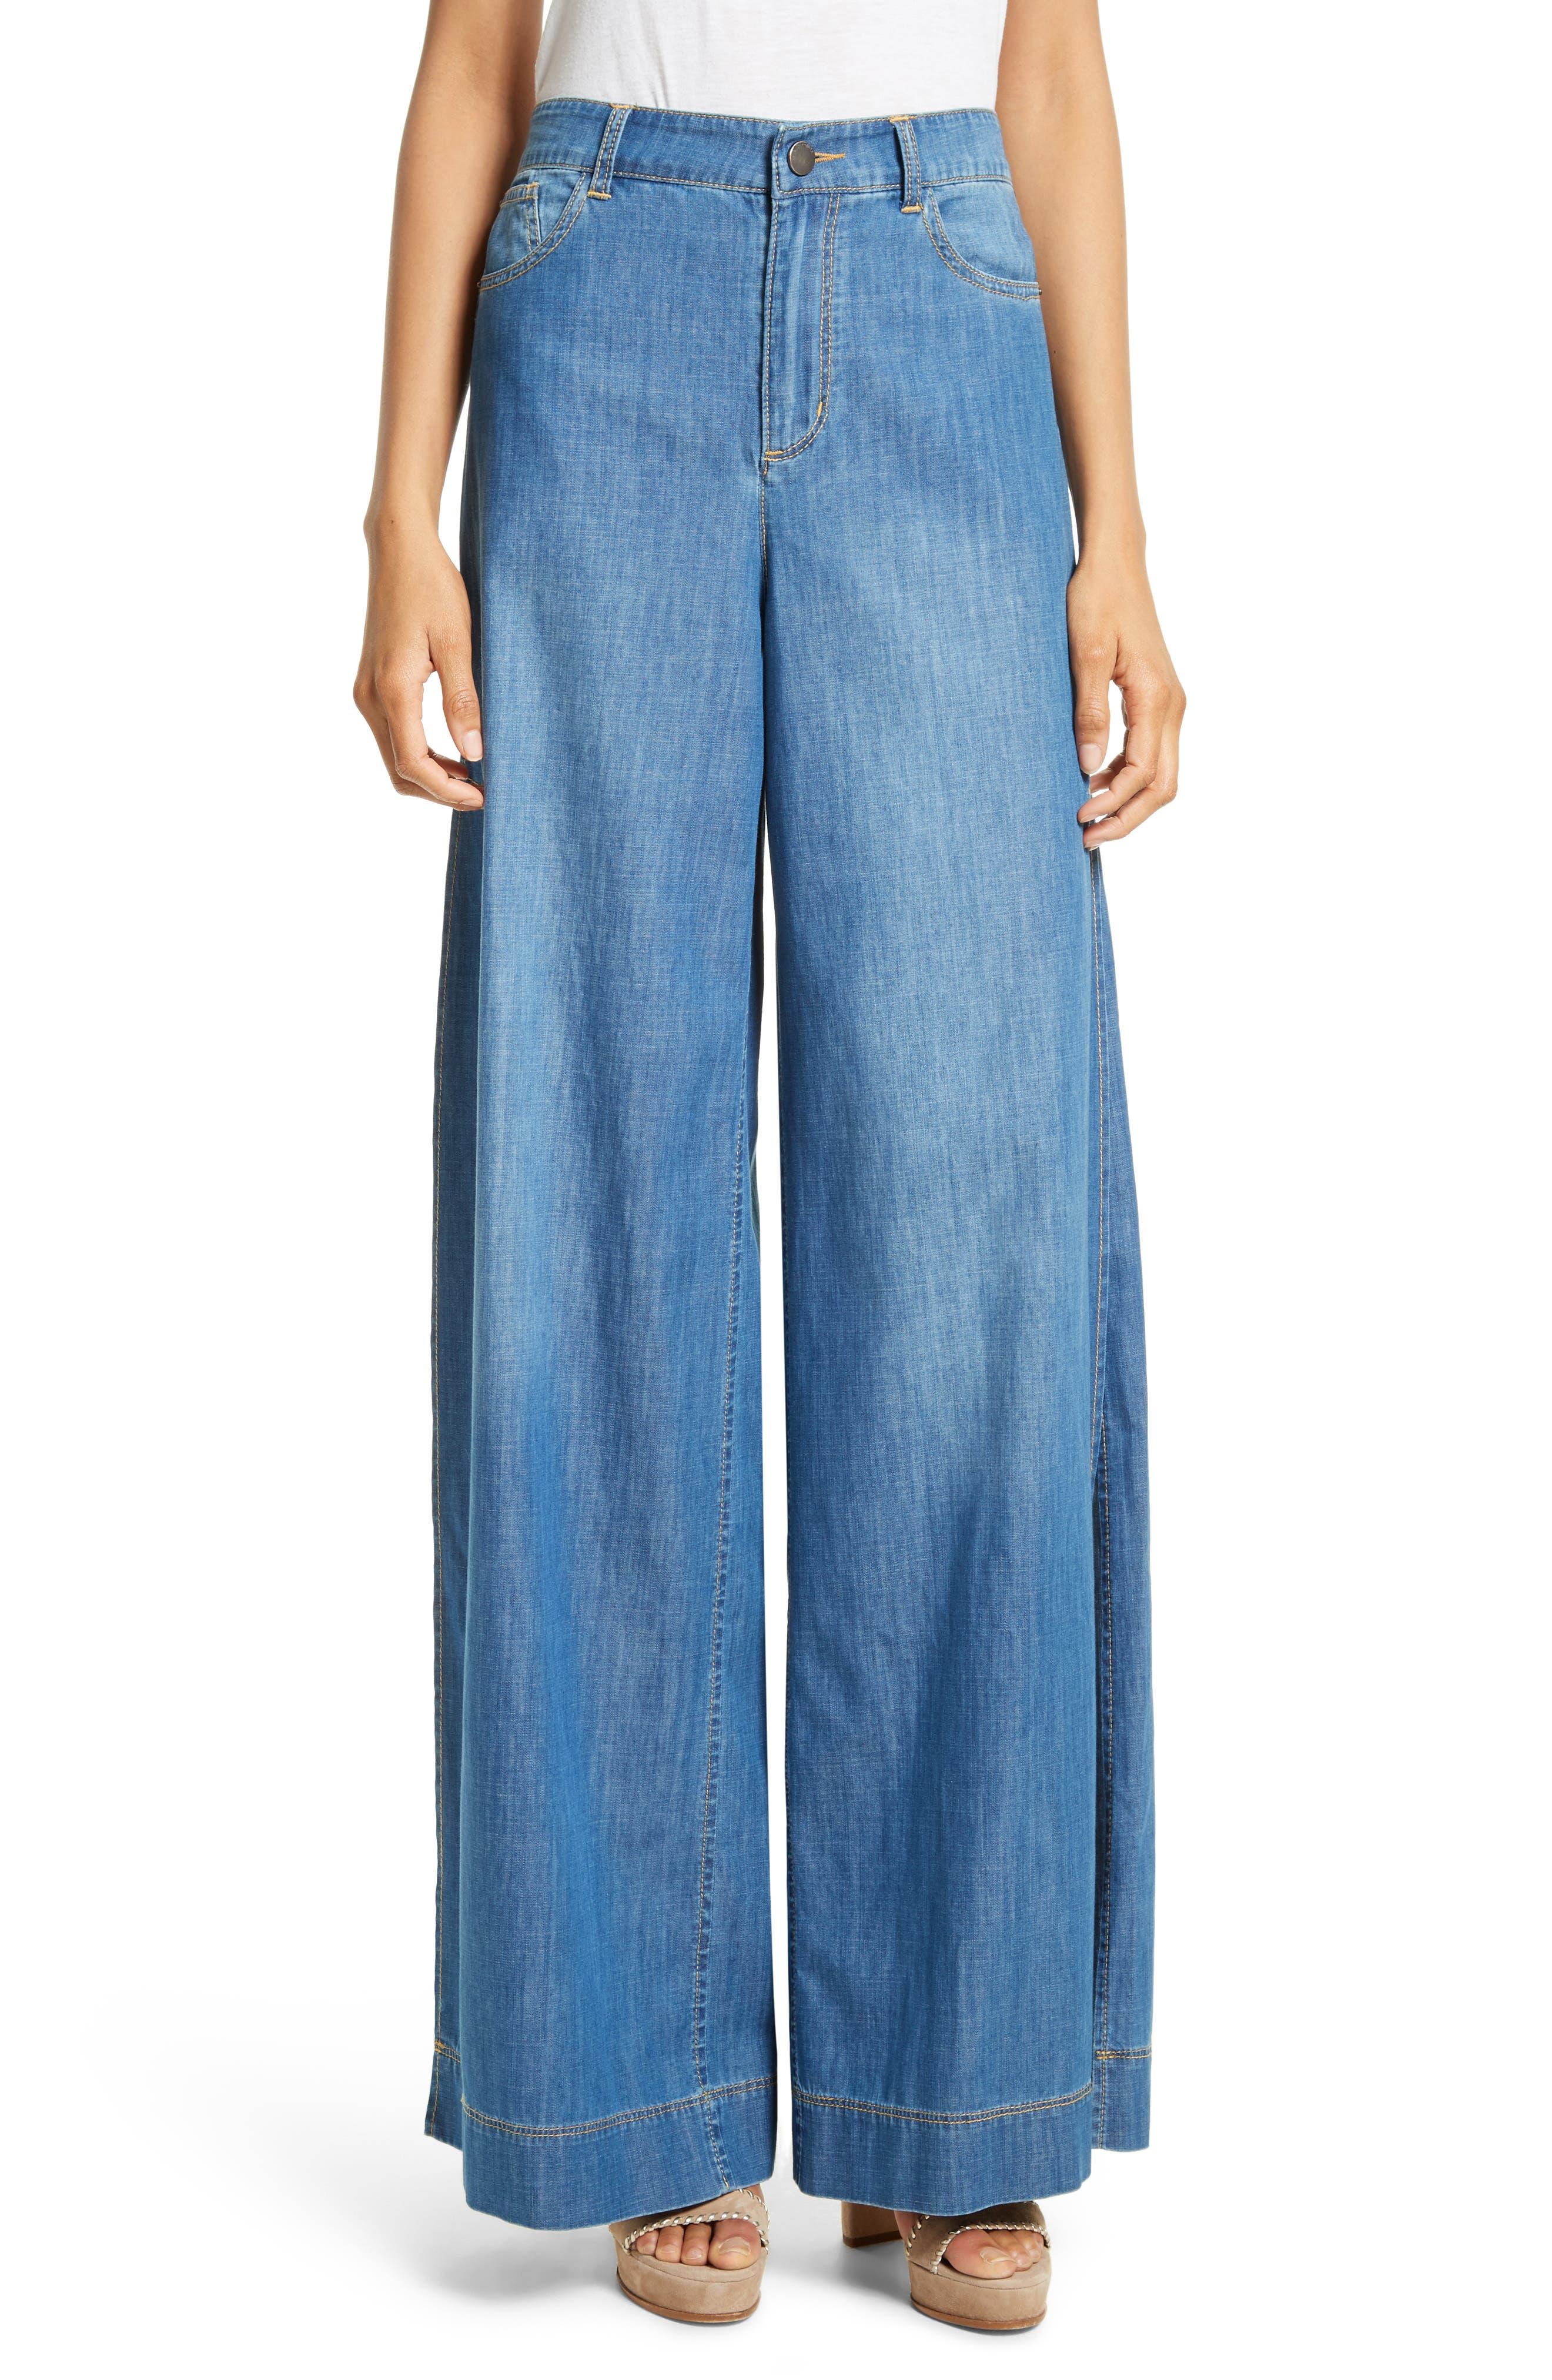 Alternate Image 1 Selected - Alice + Olivia Clarissa Side Slit Wide Leg Jeans